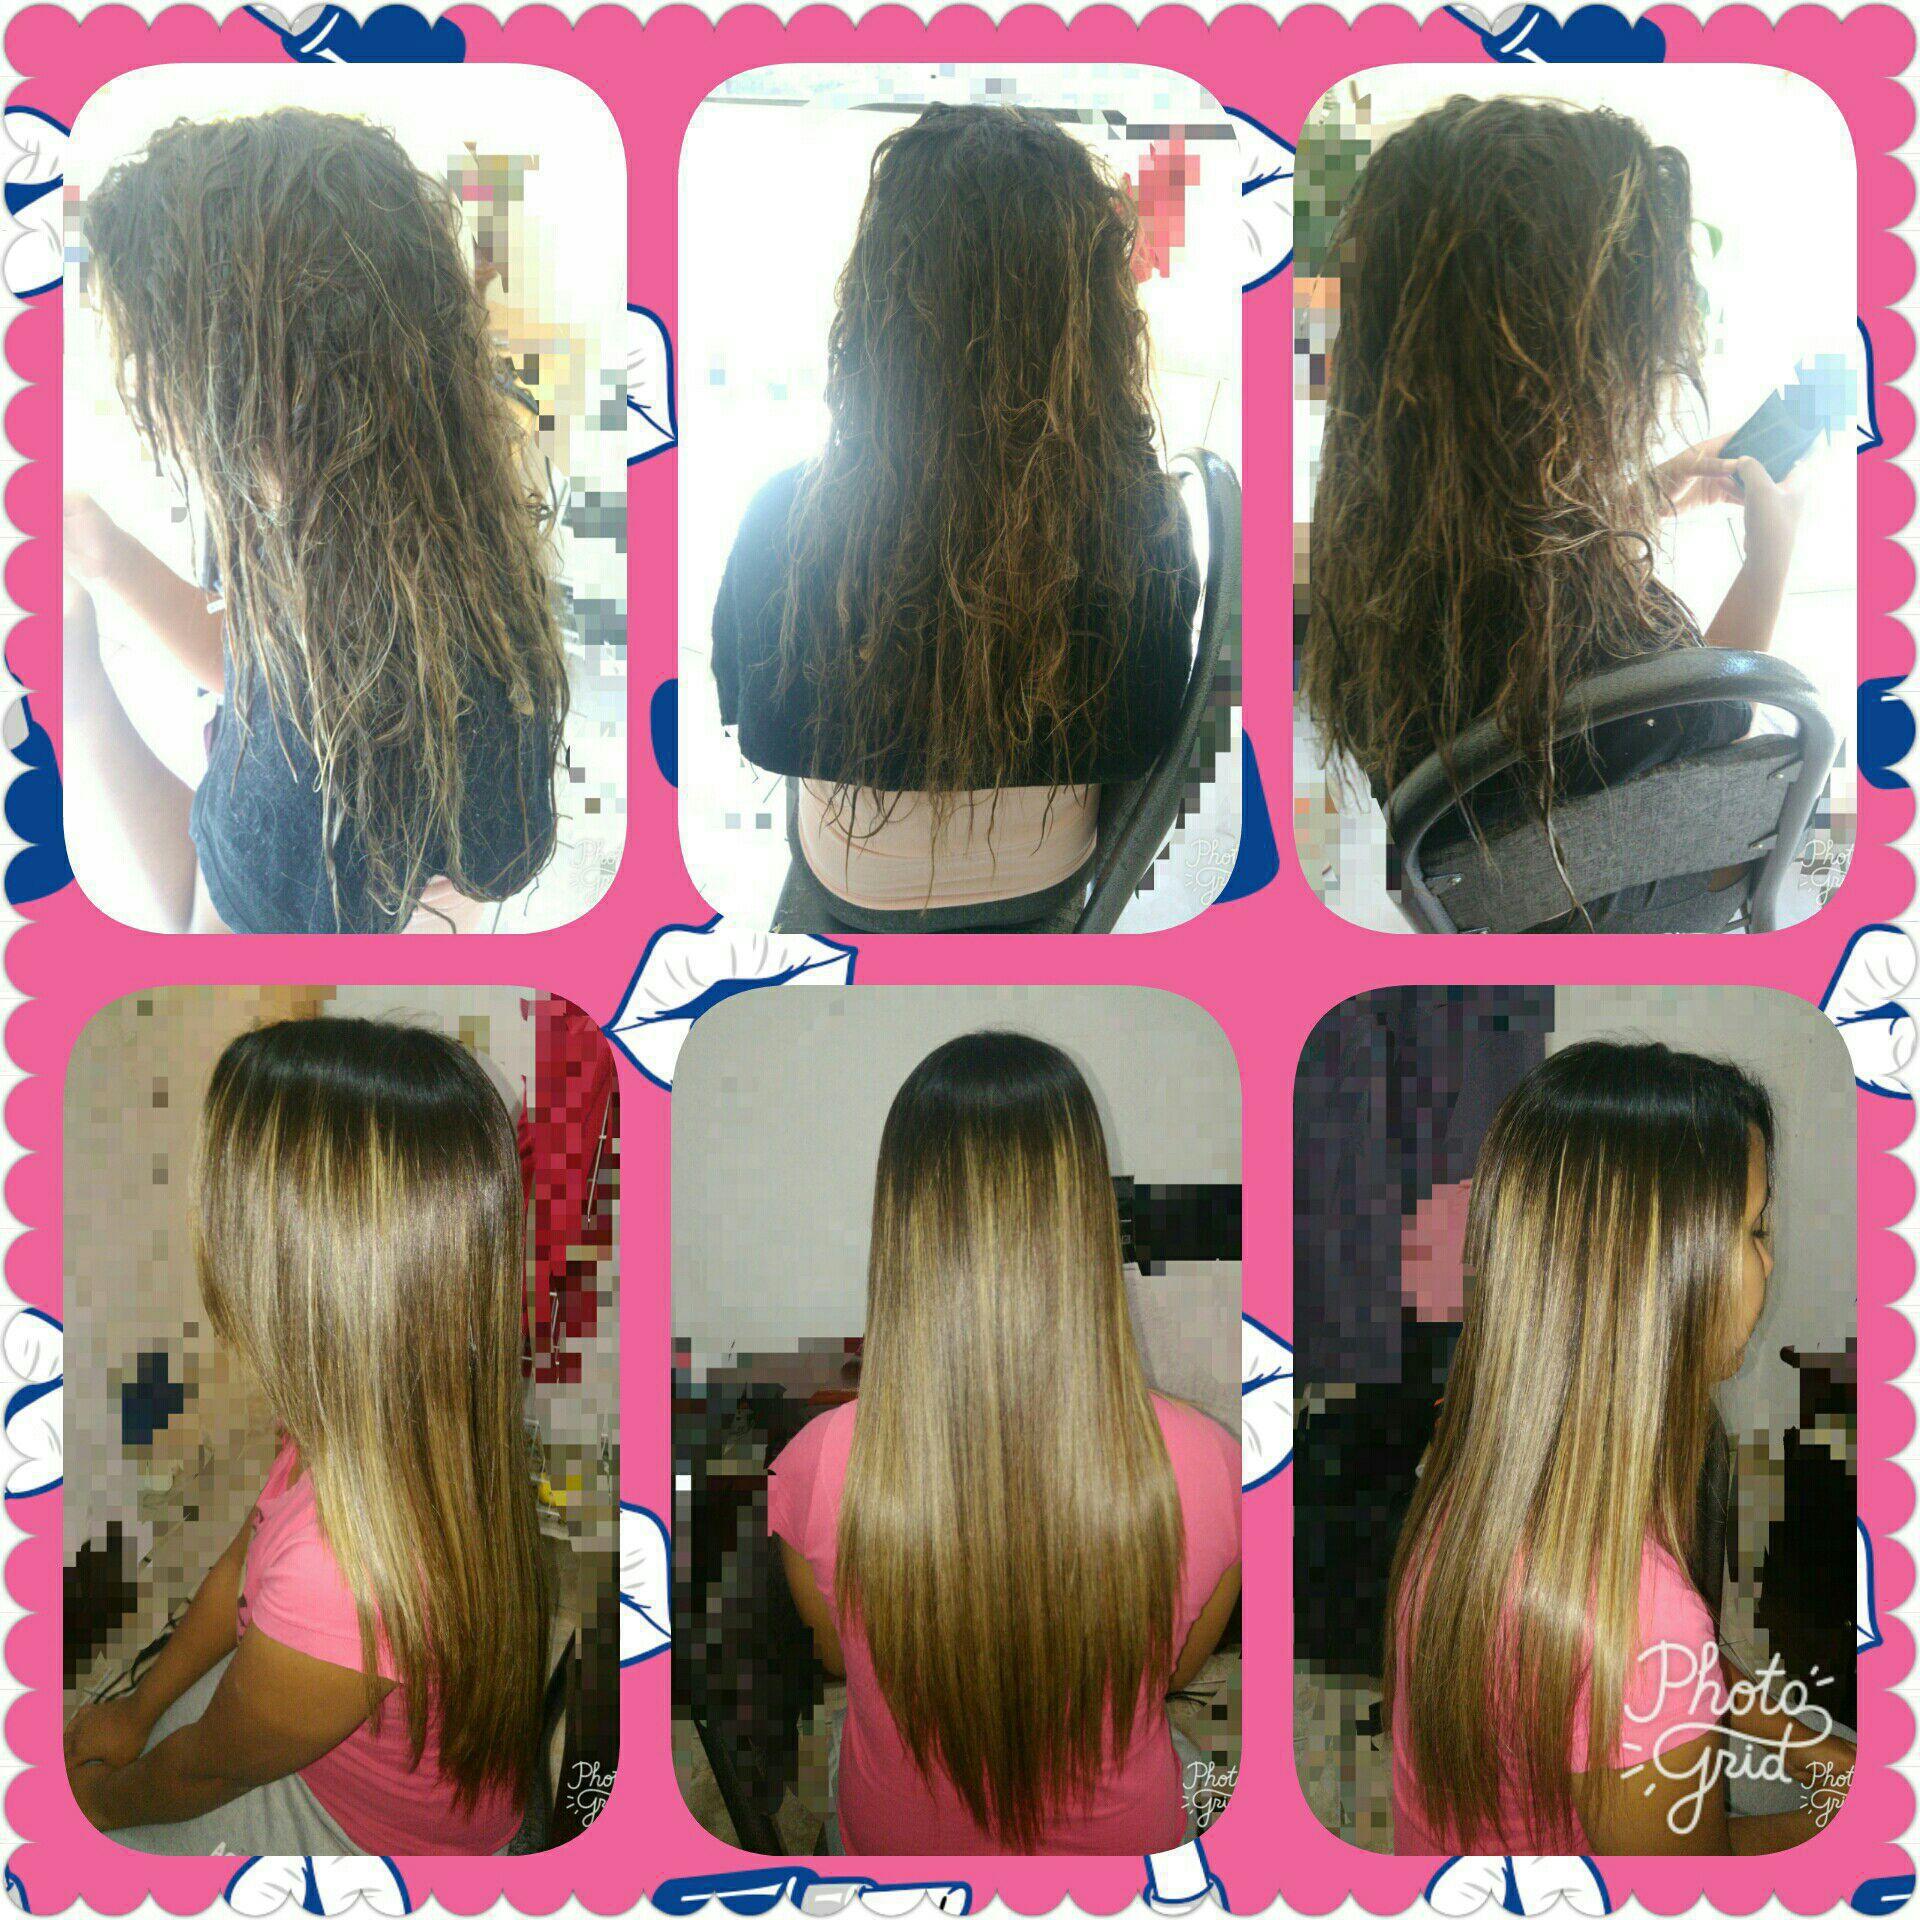 Progressiva antes depôs cabelo auxiliar cabeleireiro(a) escovista manicure e pedicure